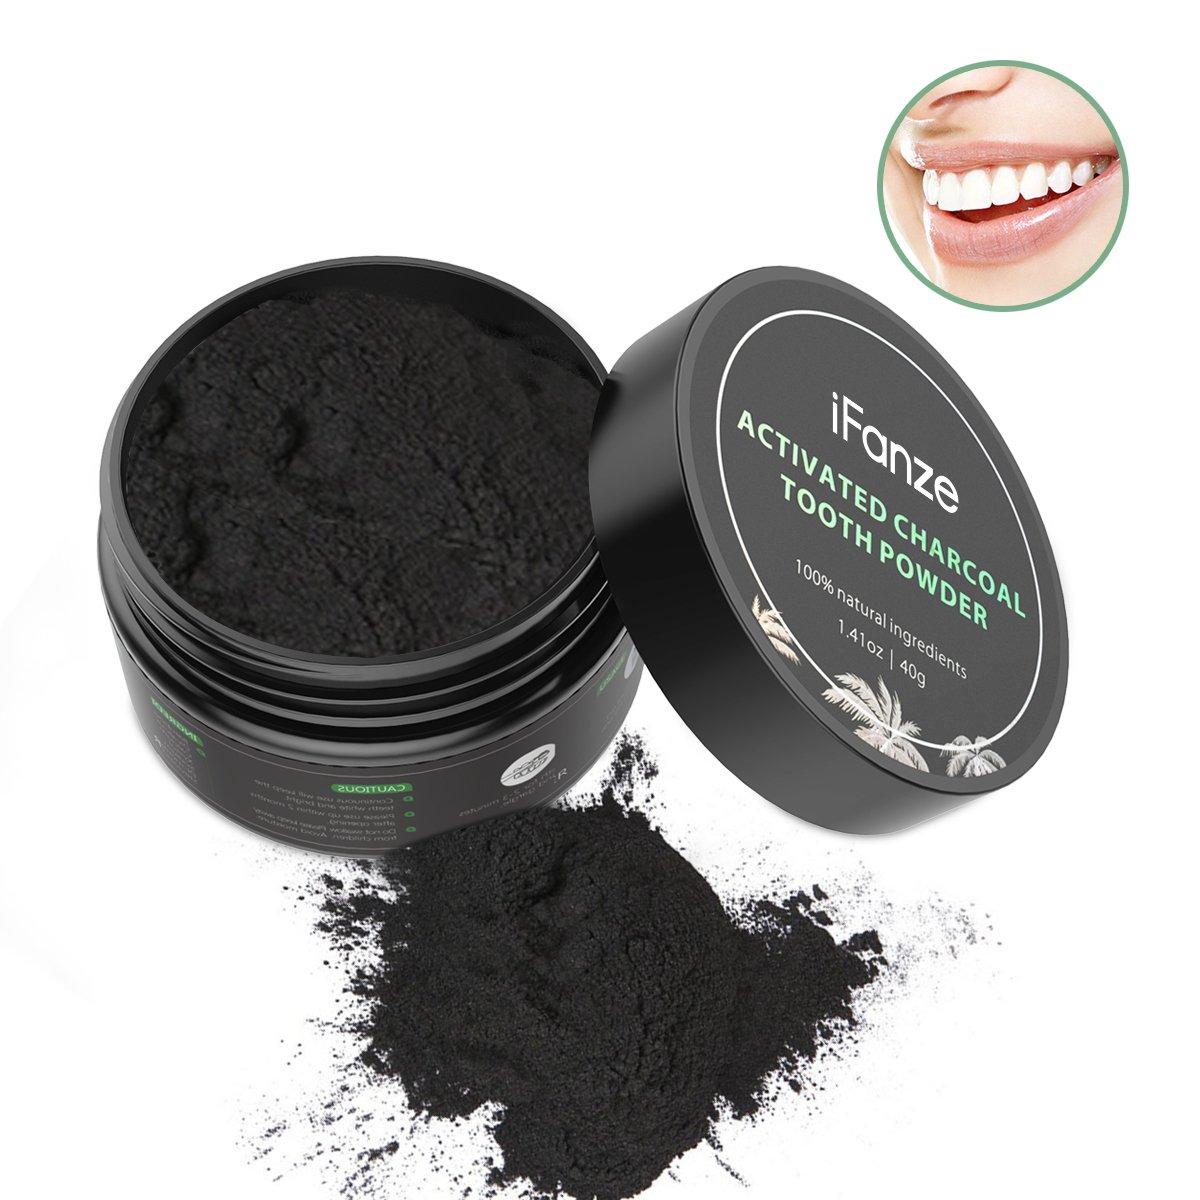 Teeth Whitening Powder, Cocoanut Active Charcoal Powder 100% Natural Charcoal Teeth Powder by iFanze (Black)